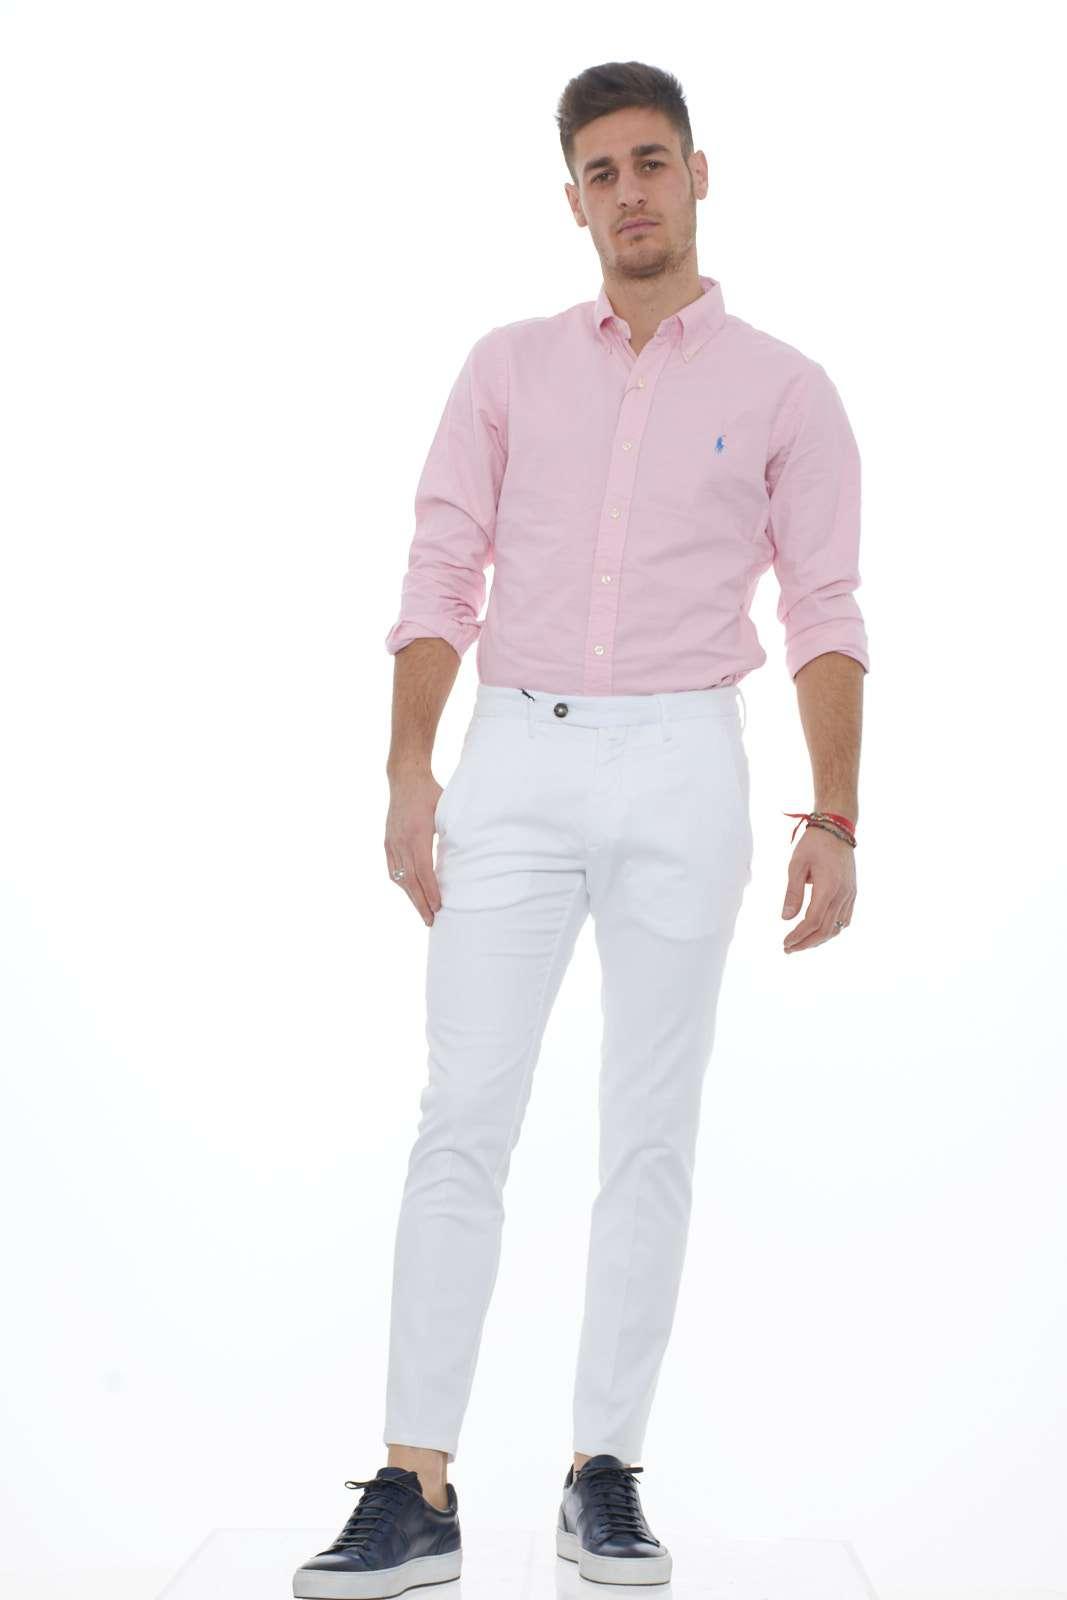 https://www.parmax.com/media/catalog/product/a/i/PE-outlet_parmax-pantalone-uomo-Michael-Coal-RICKY3360-D.jpg